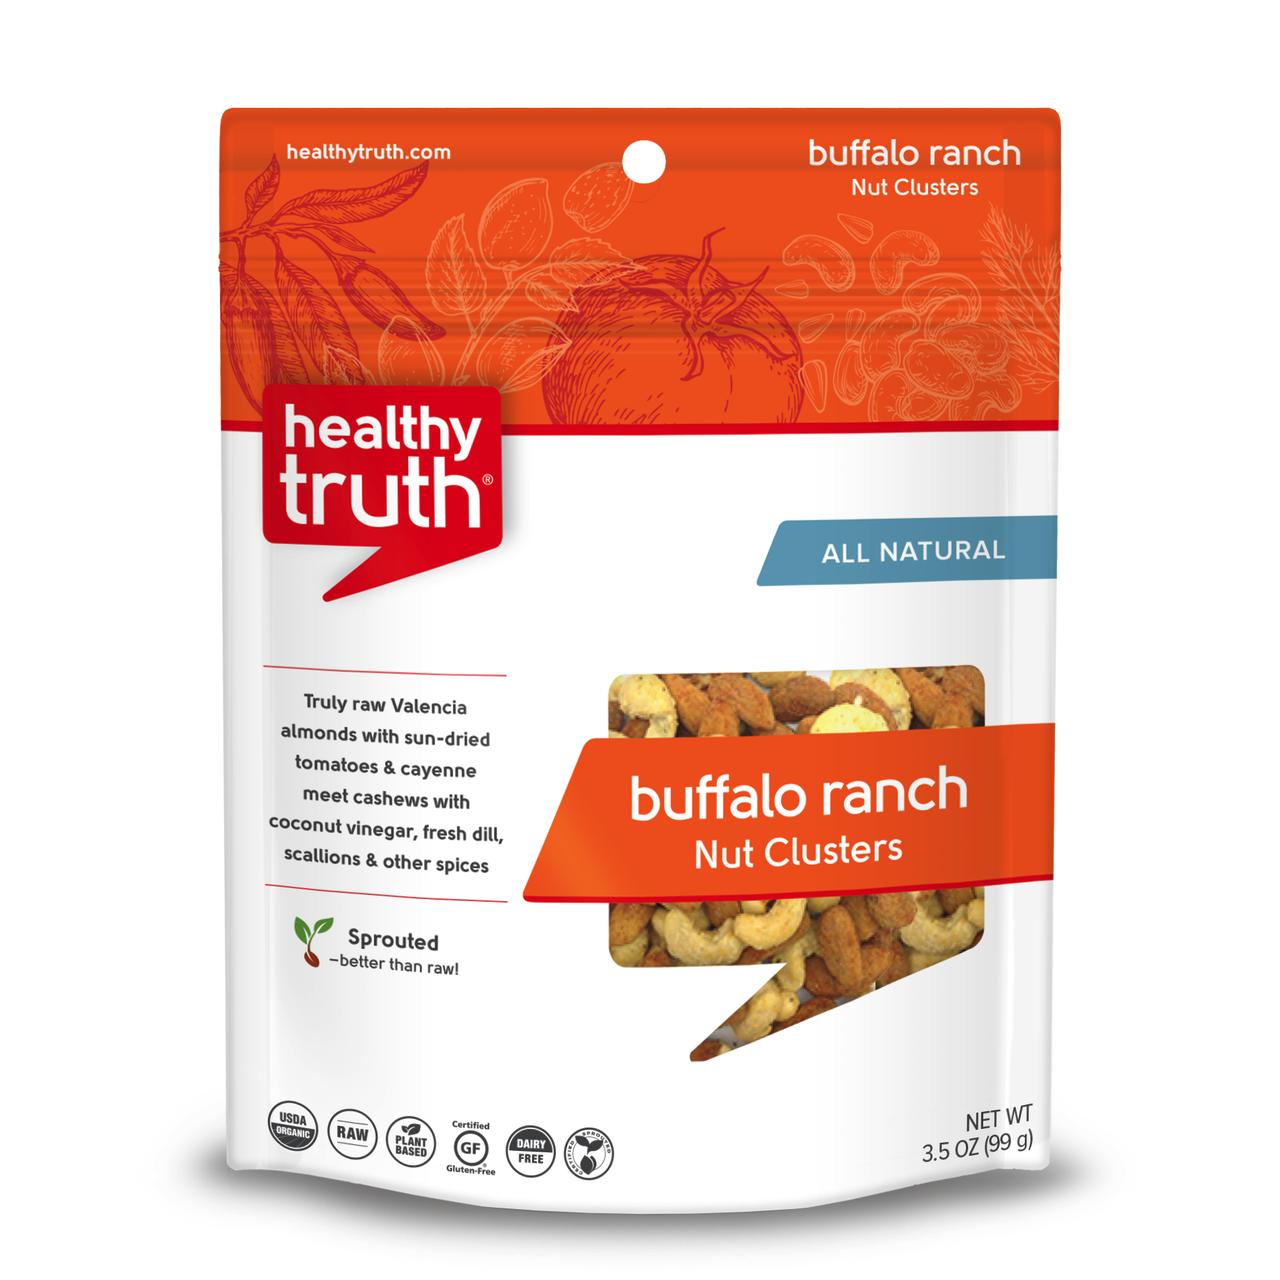 Buffalo Ranch Nut Clusters - Heathly Truth - Certified Paleo, Paleo Vegan - Paleo Foundation